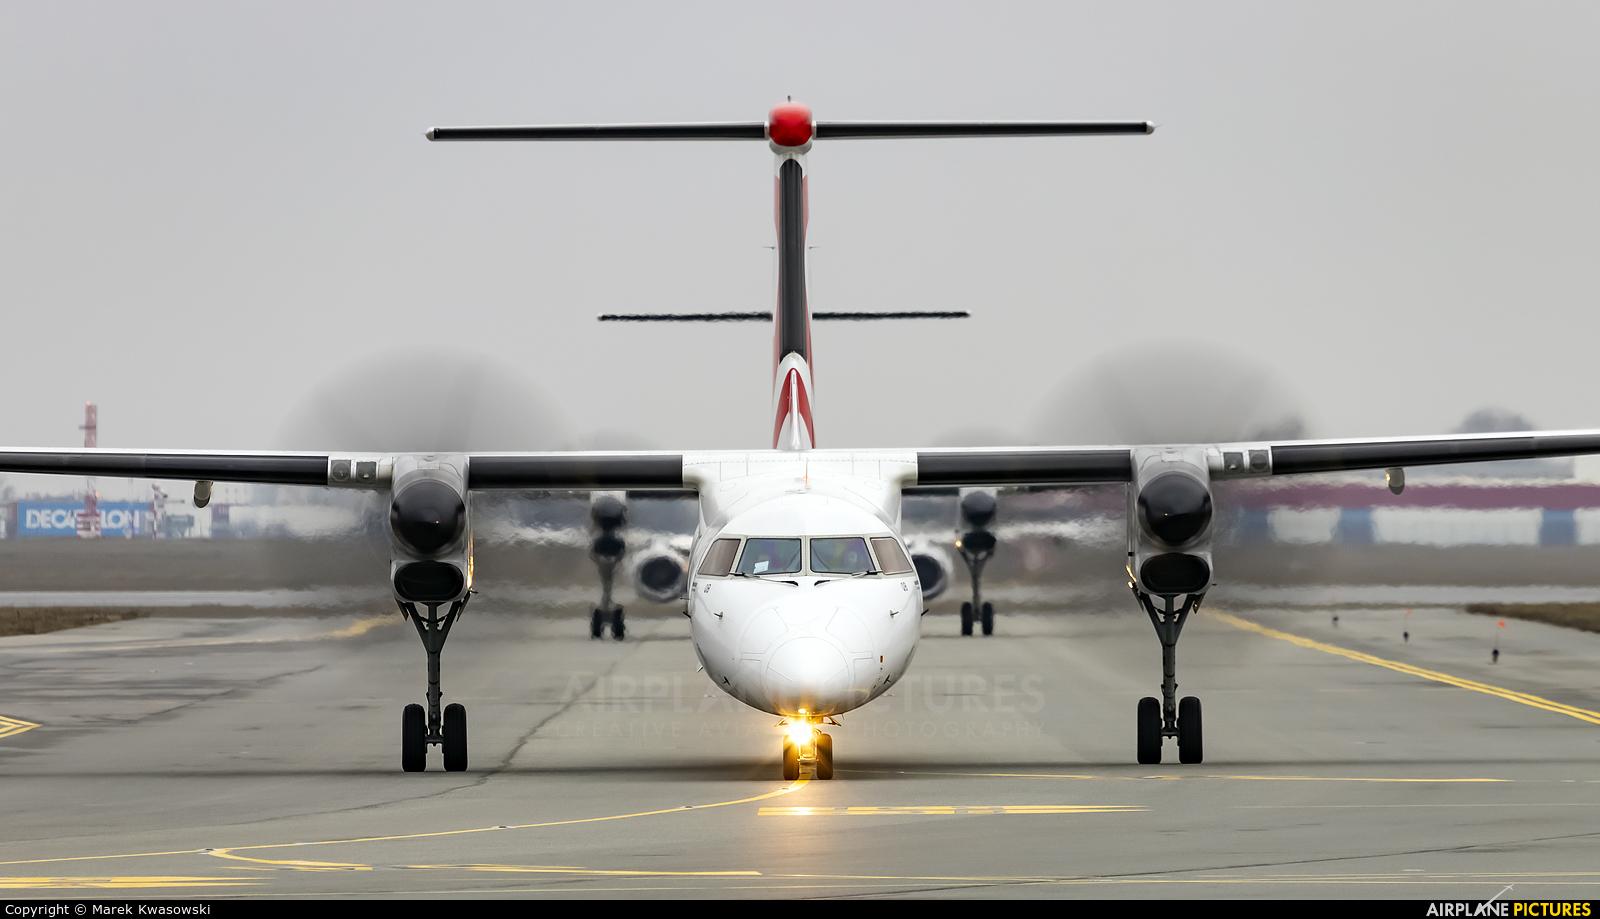 LOT - Polish Airlines SP-EQB aircraft at Warsaw - Frederic Chopin